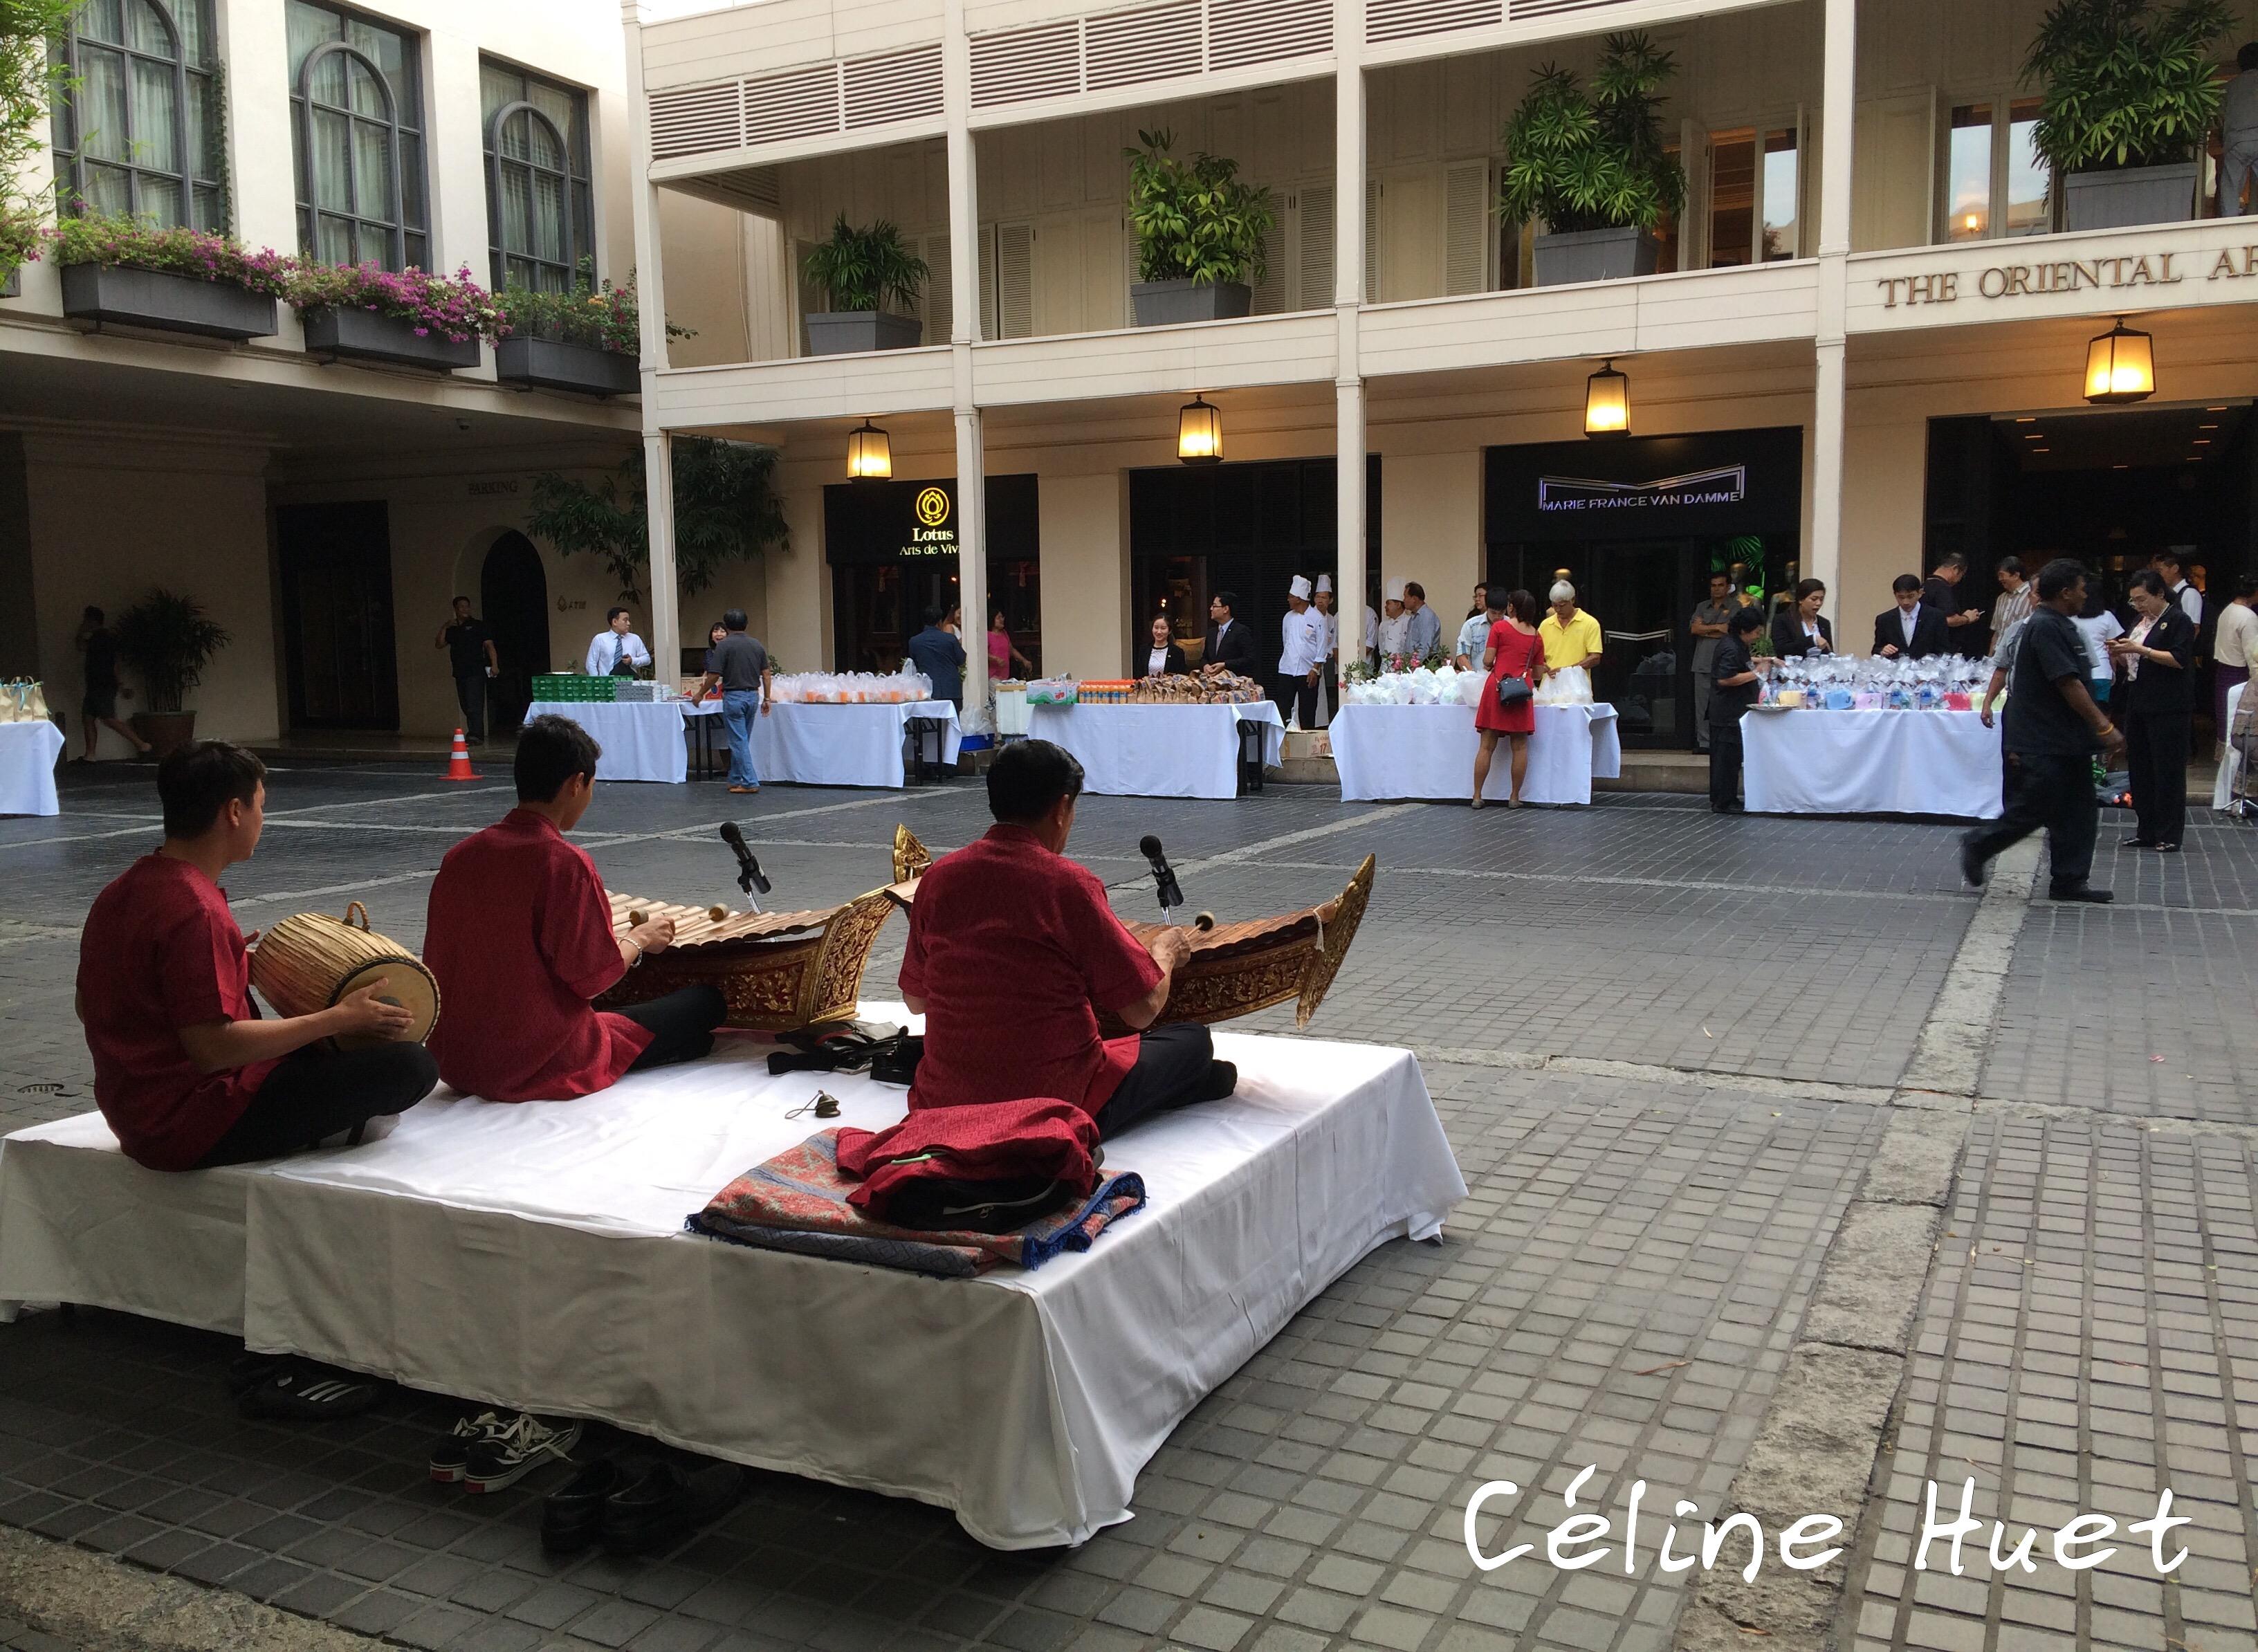 140e anniversaire Préparation Cérémonie Moines Mandarin Oriental Bangkok Thaïlande Asie